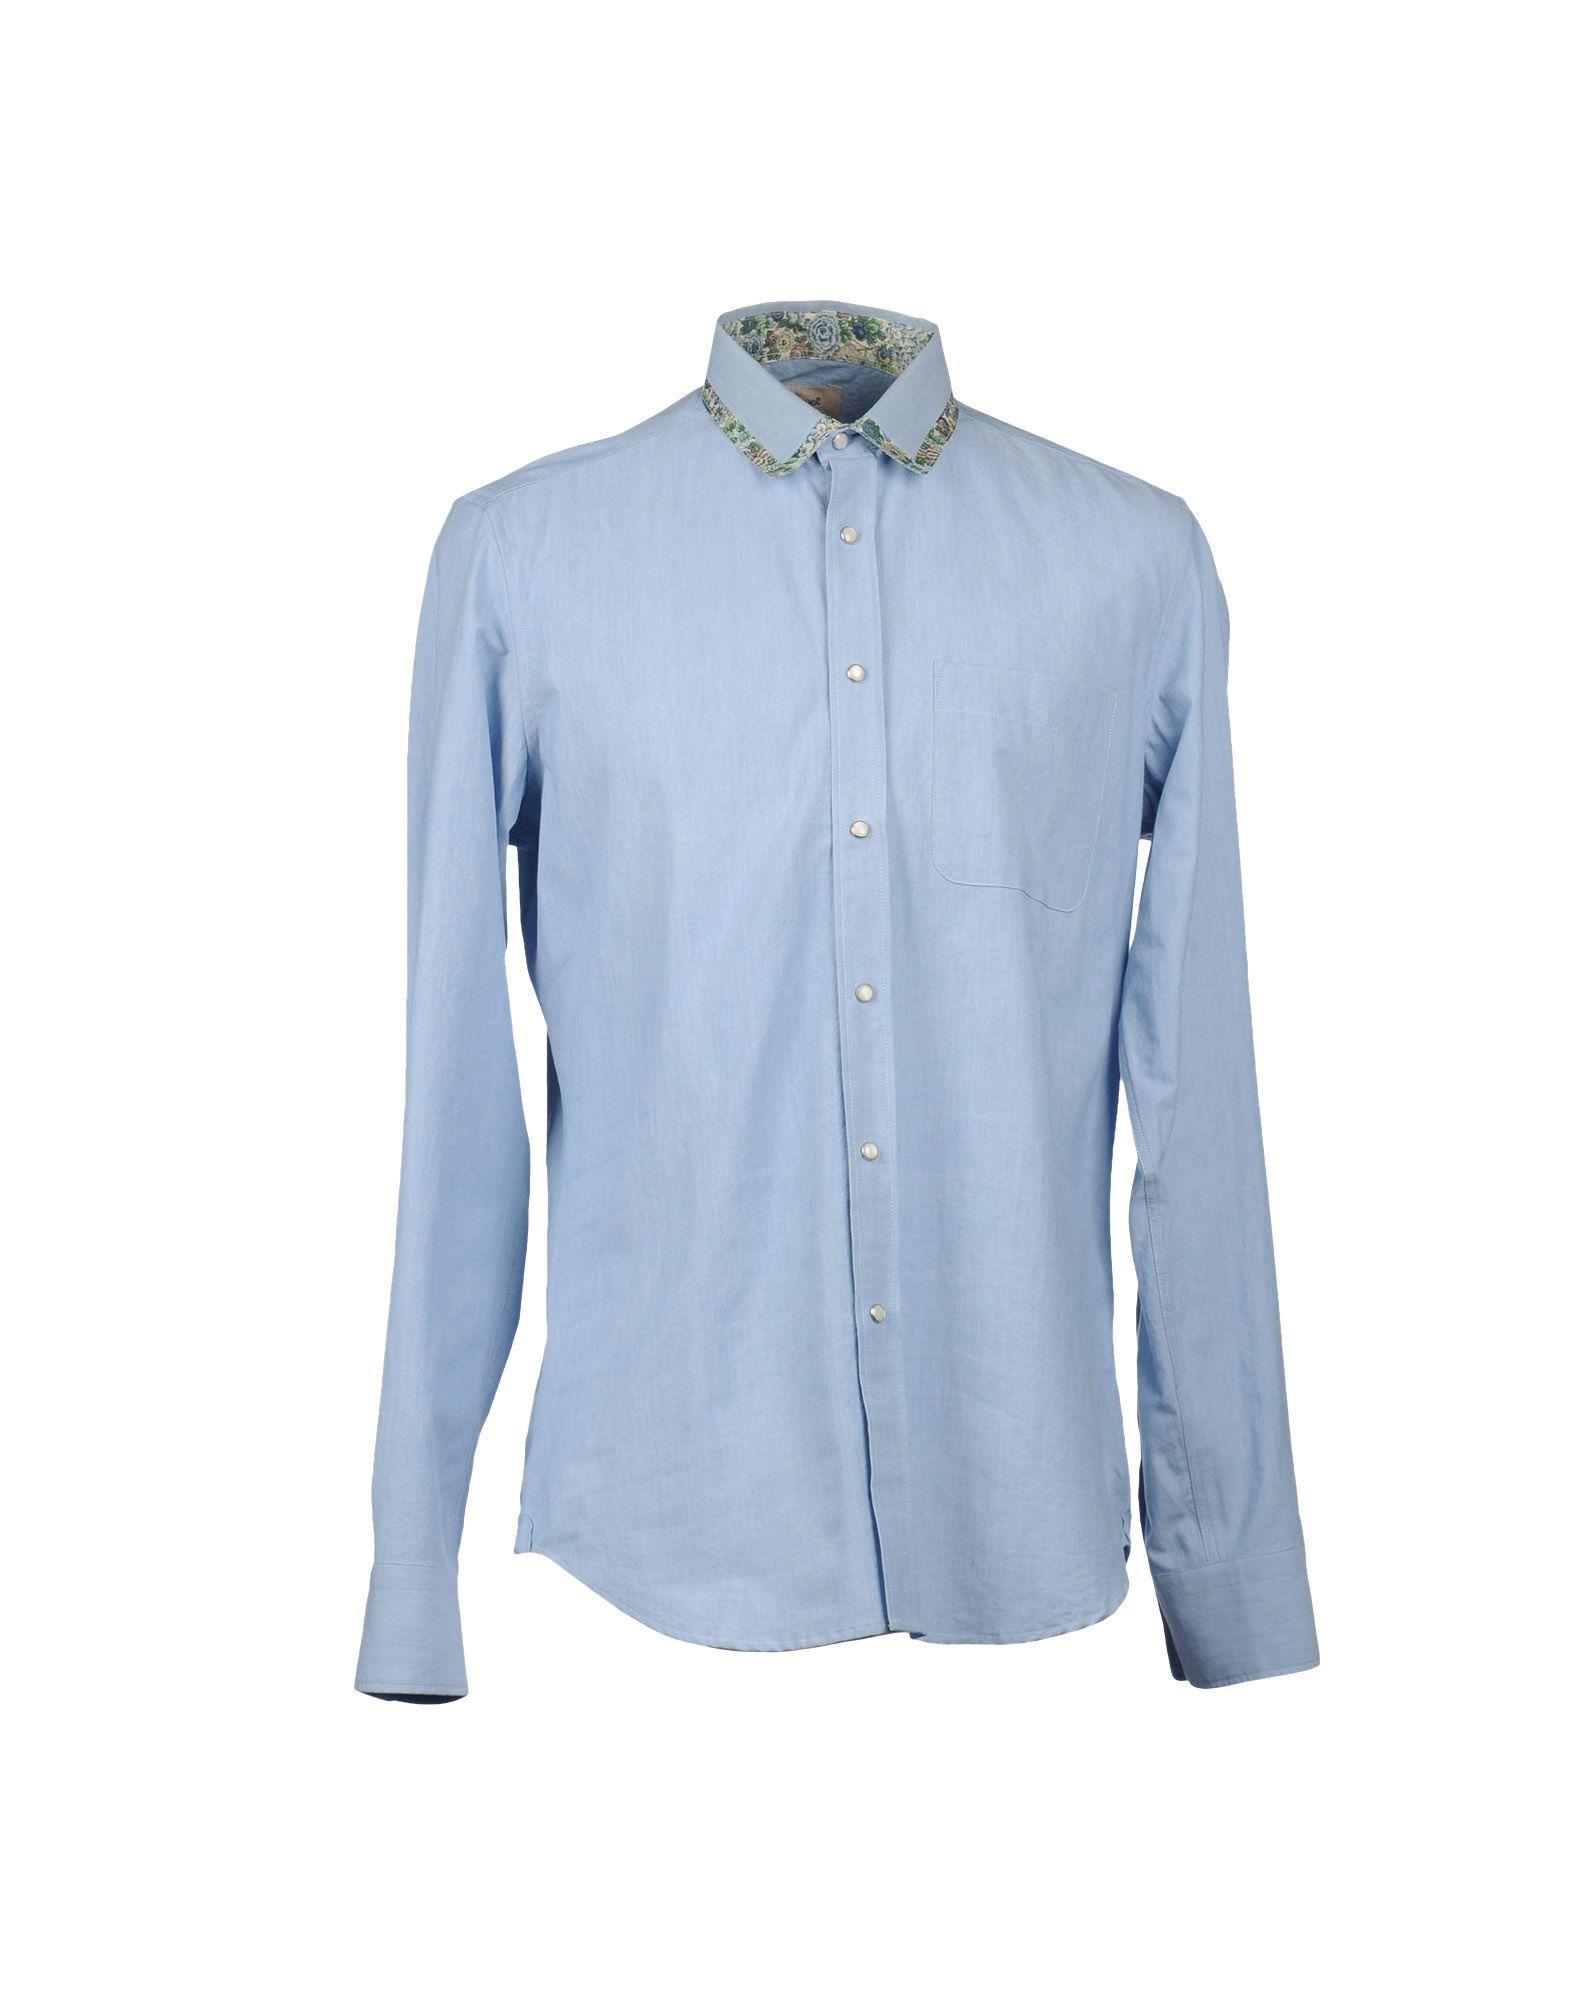 COAST WEBER & AHAUS Рубашка с длинными рукавами рубашка gerry weber gerry weber ge002ewwra96